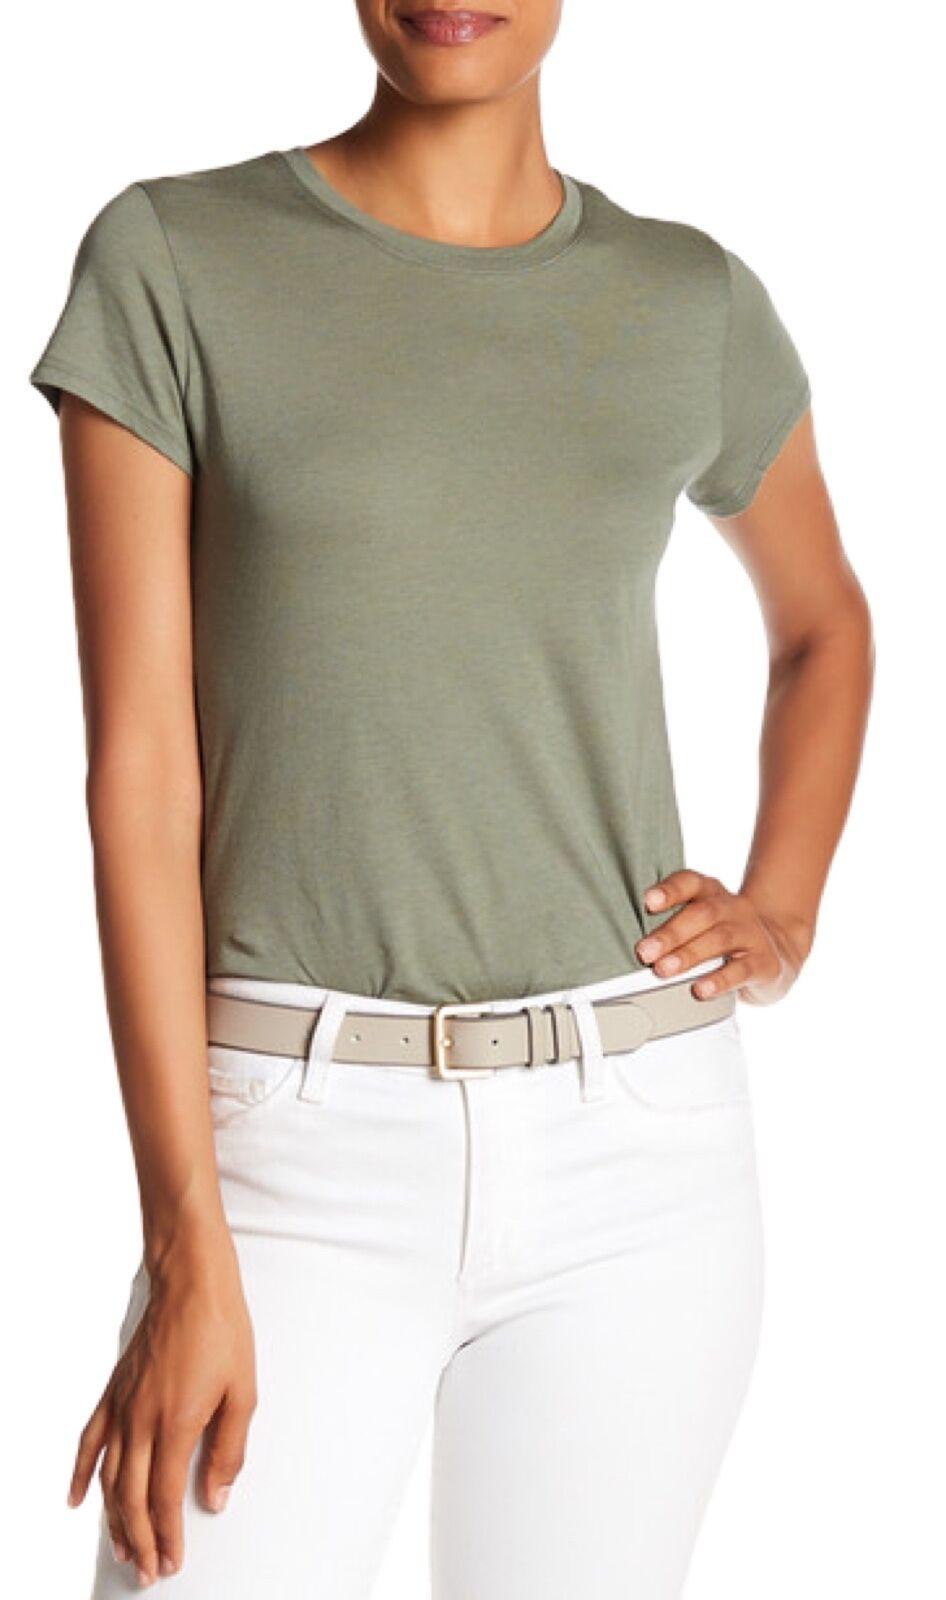 NWT Vince Women's Boy Basic Tee T Shirt Pima Cotton Top Green Sage Medium M